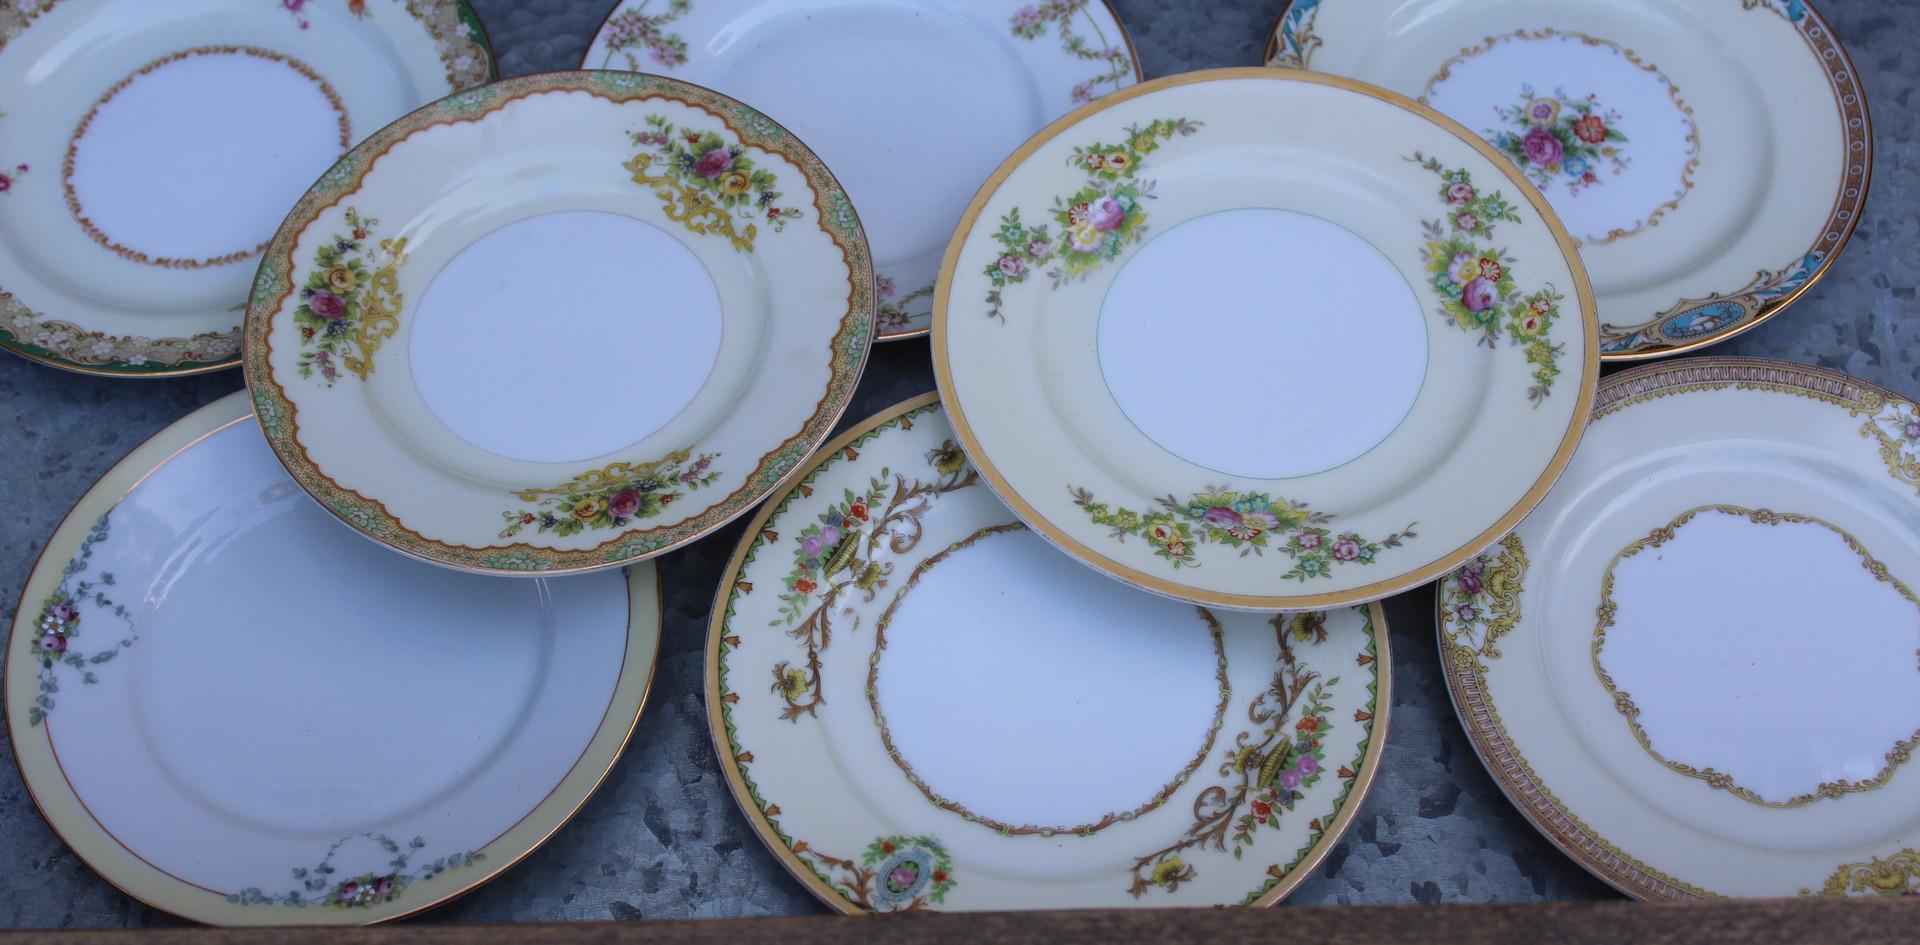 Moxed Bouquet dessert plates